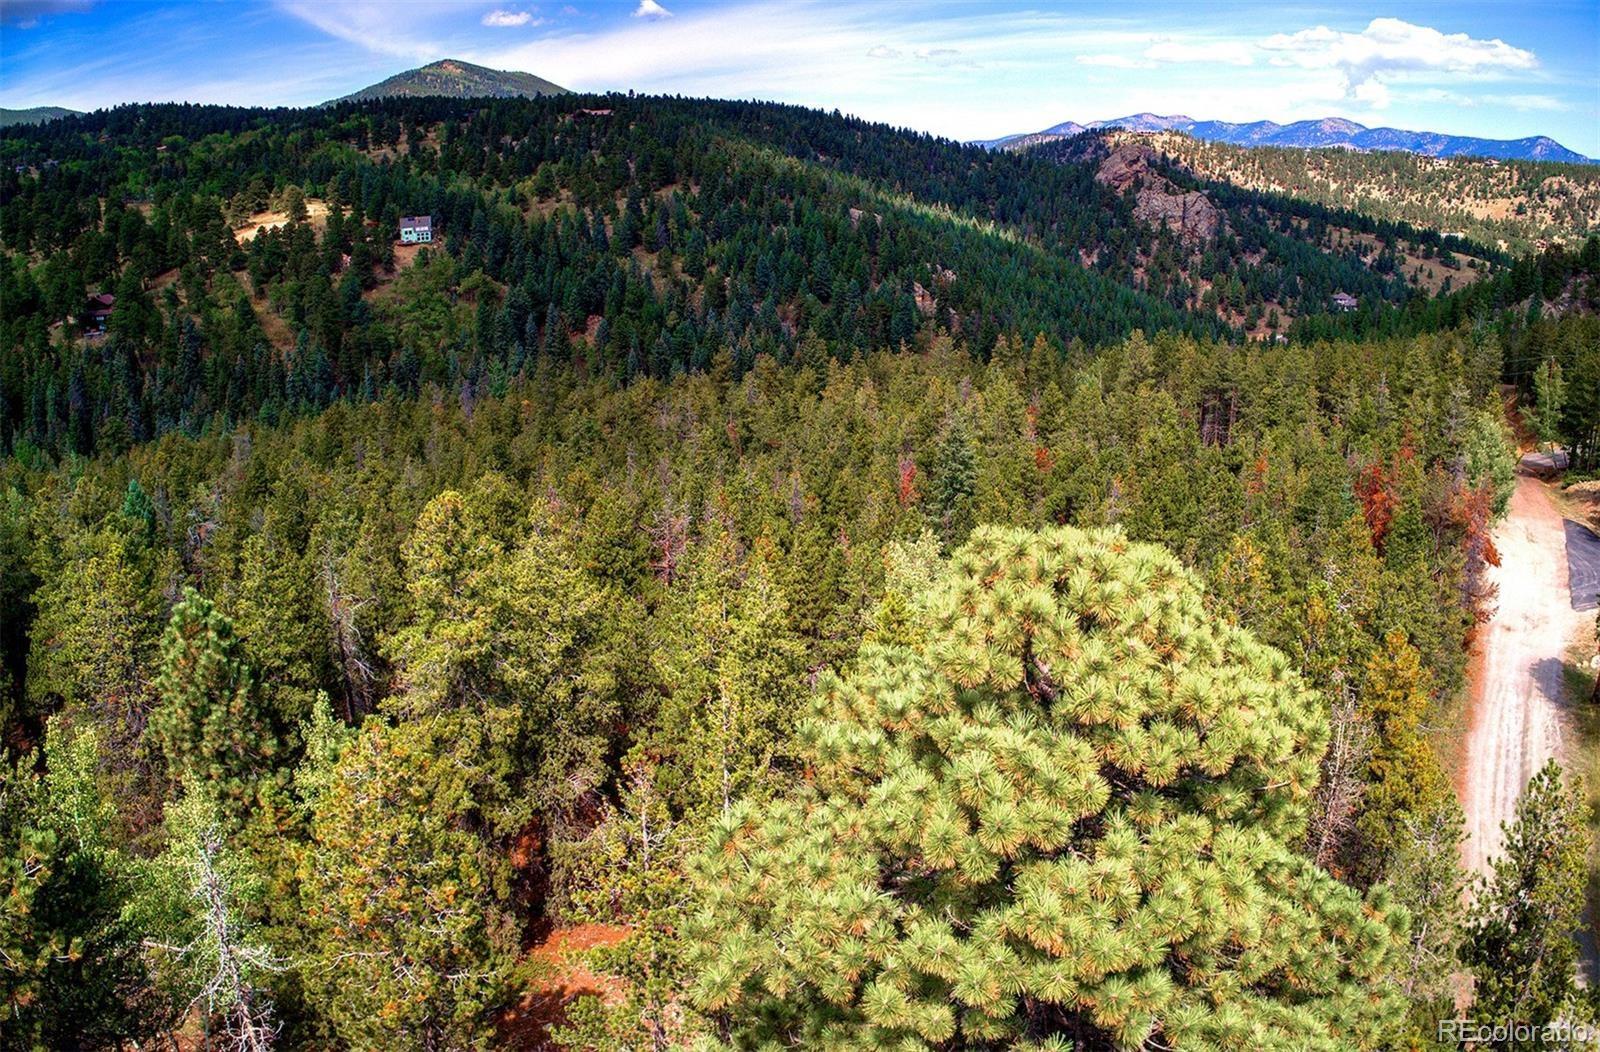 MLS# 2193114 - 6 - 1 Mountain Estate Drive, Evergreen, CO 80439